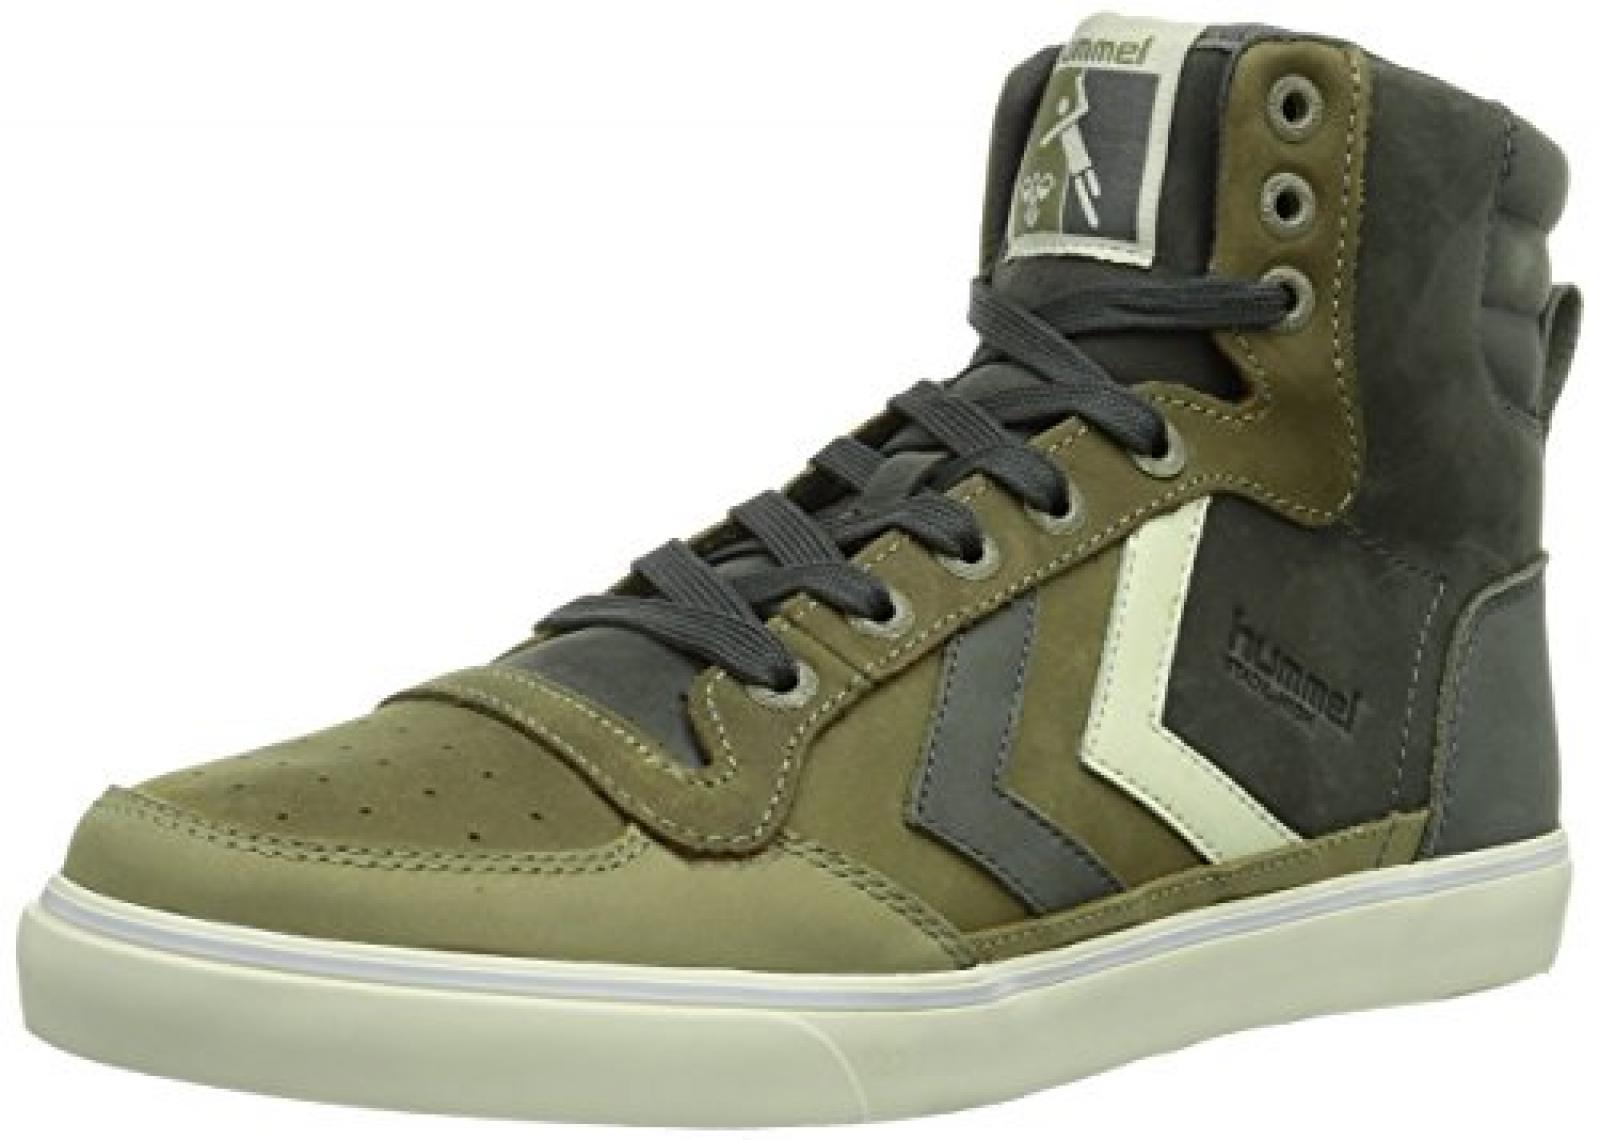 hummel HUMMEL STADIL HIGH, Unisex-Erwachsene Hohe Sneakers